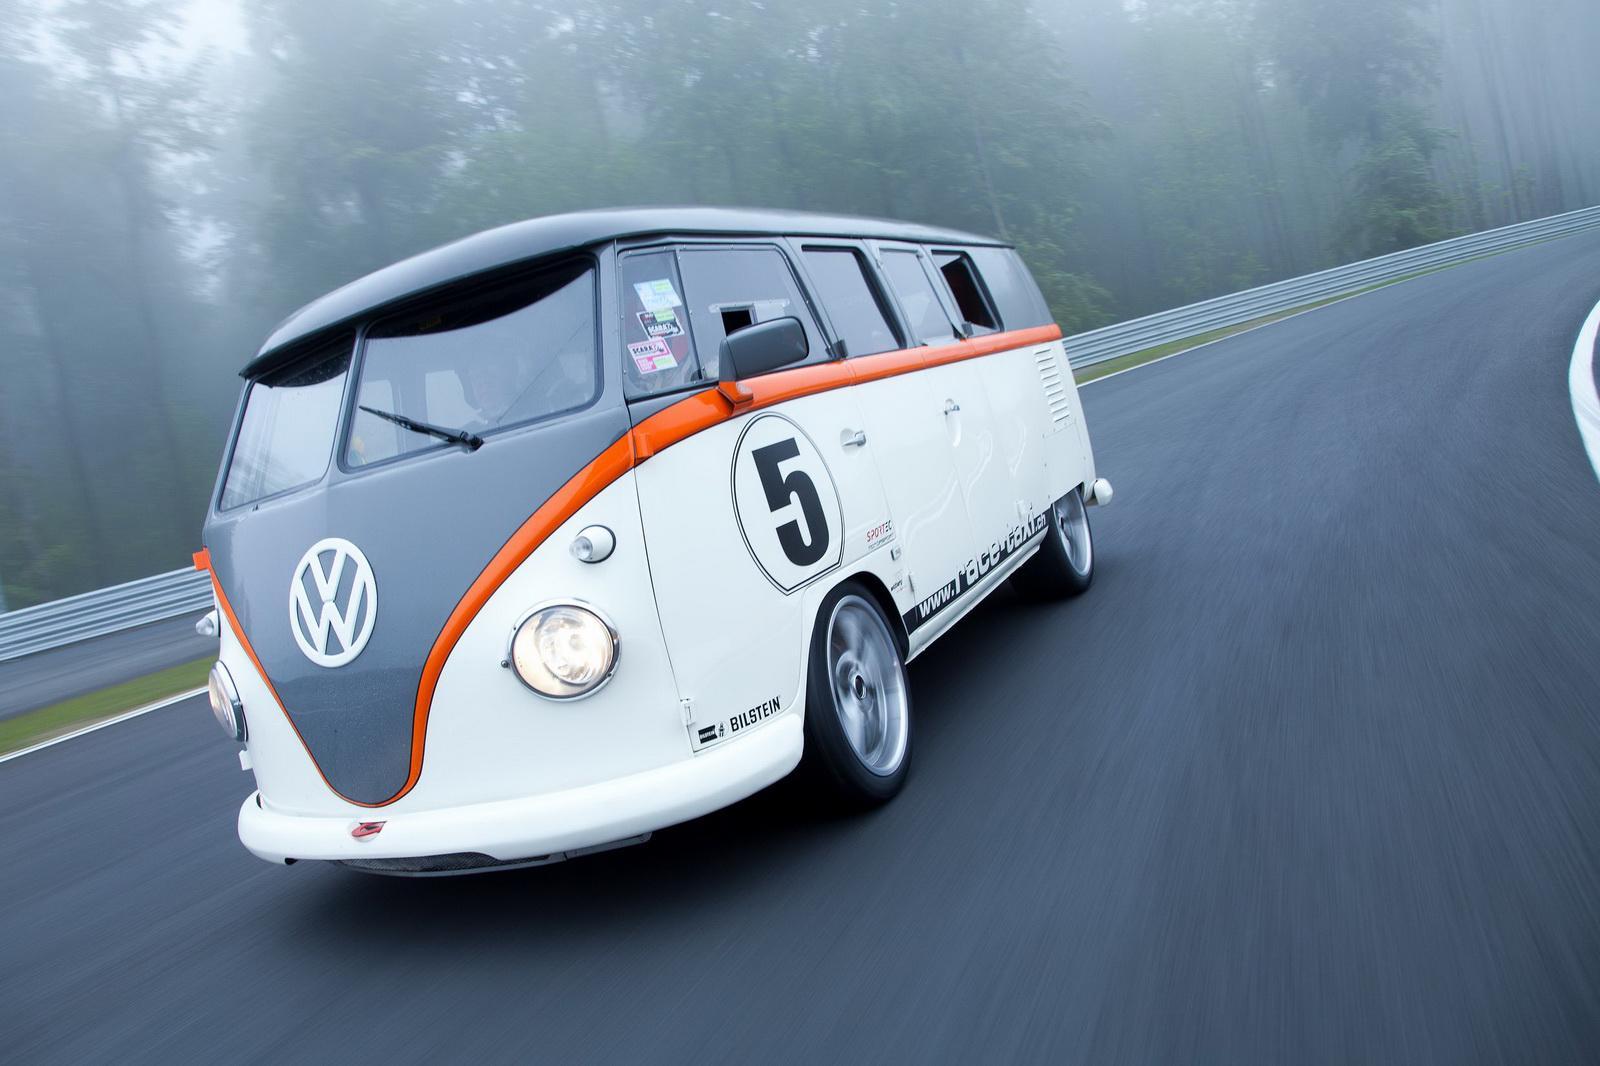 Hyundai Spy Shots >> Porsche-Powered Volkswagen Bus 'Race Taxi' Debuts At Wörthersee